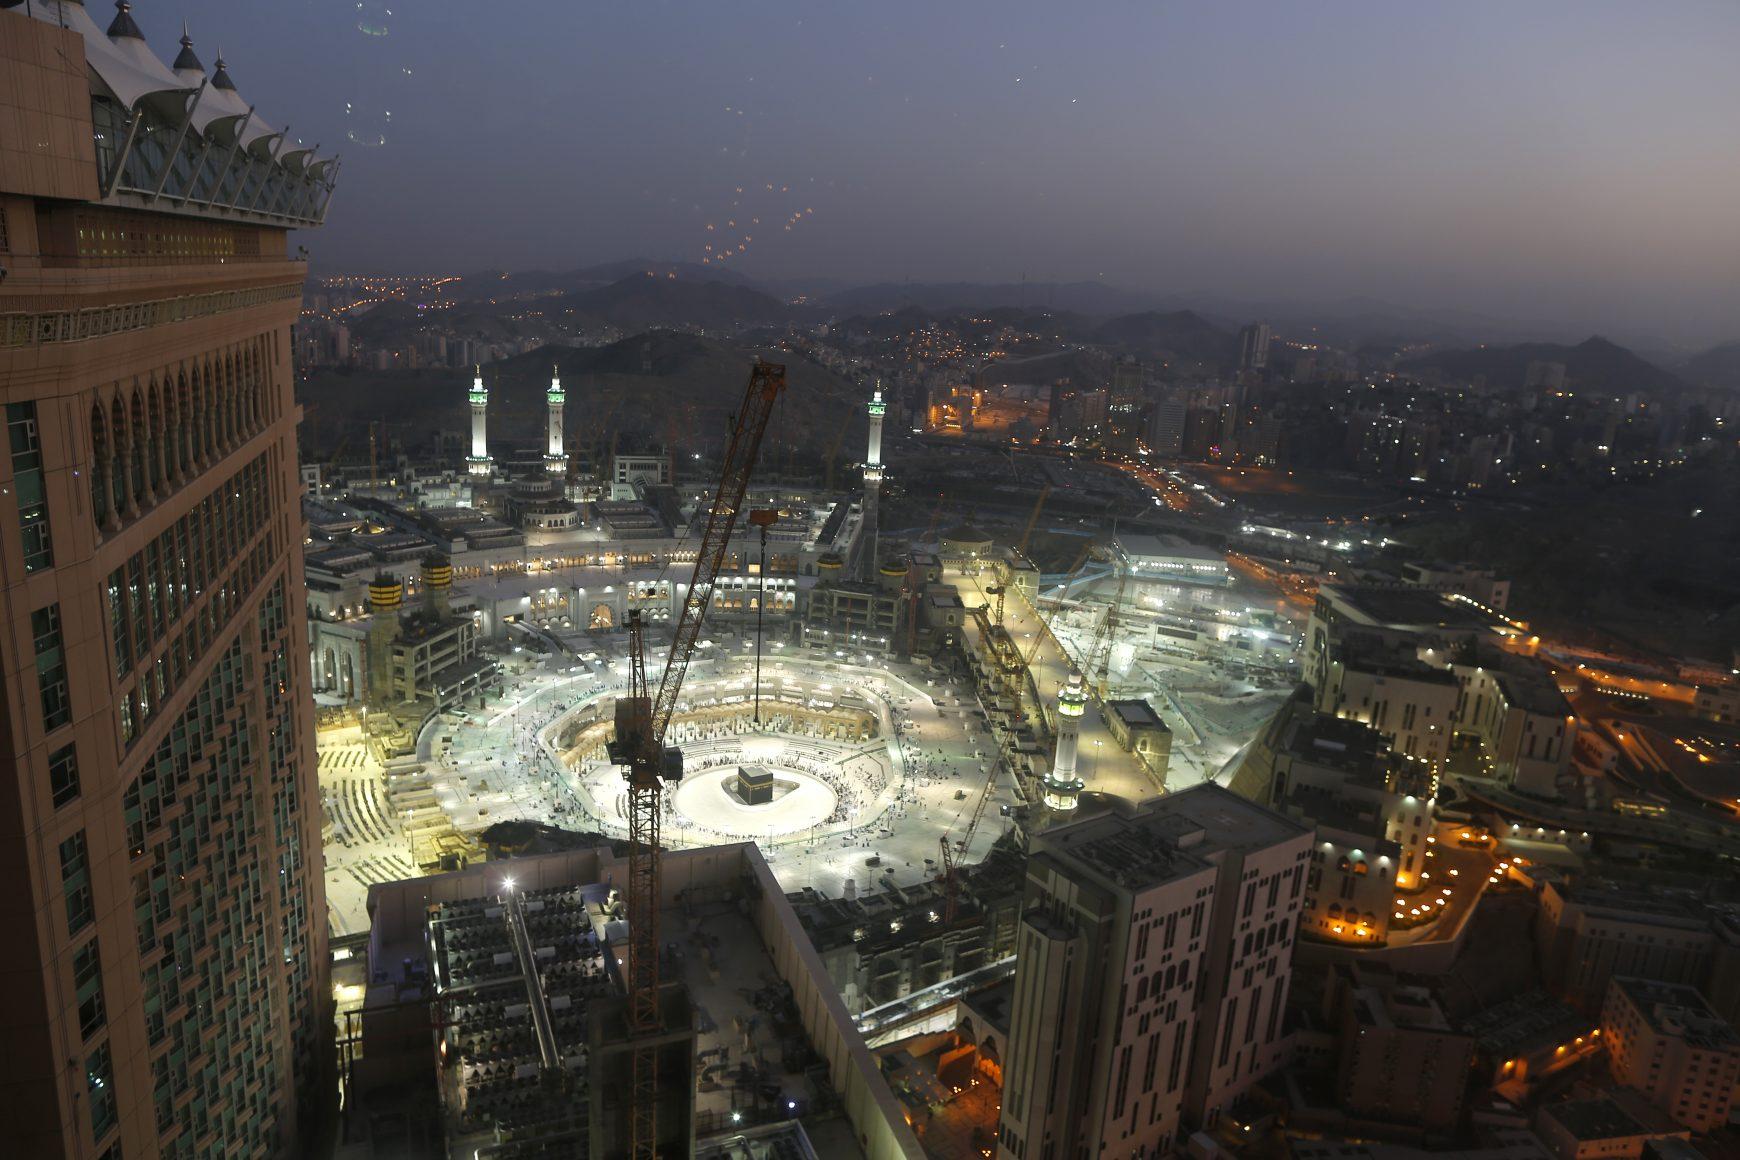 The Grand Mosque, in the Muslim holy city of Mecca, Saudi Arabia